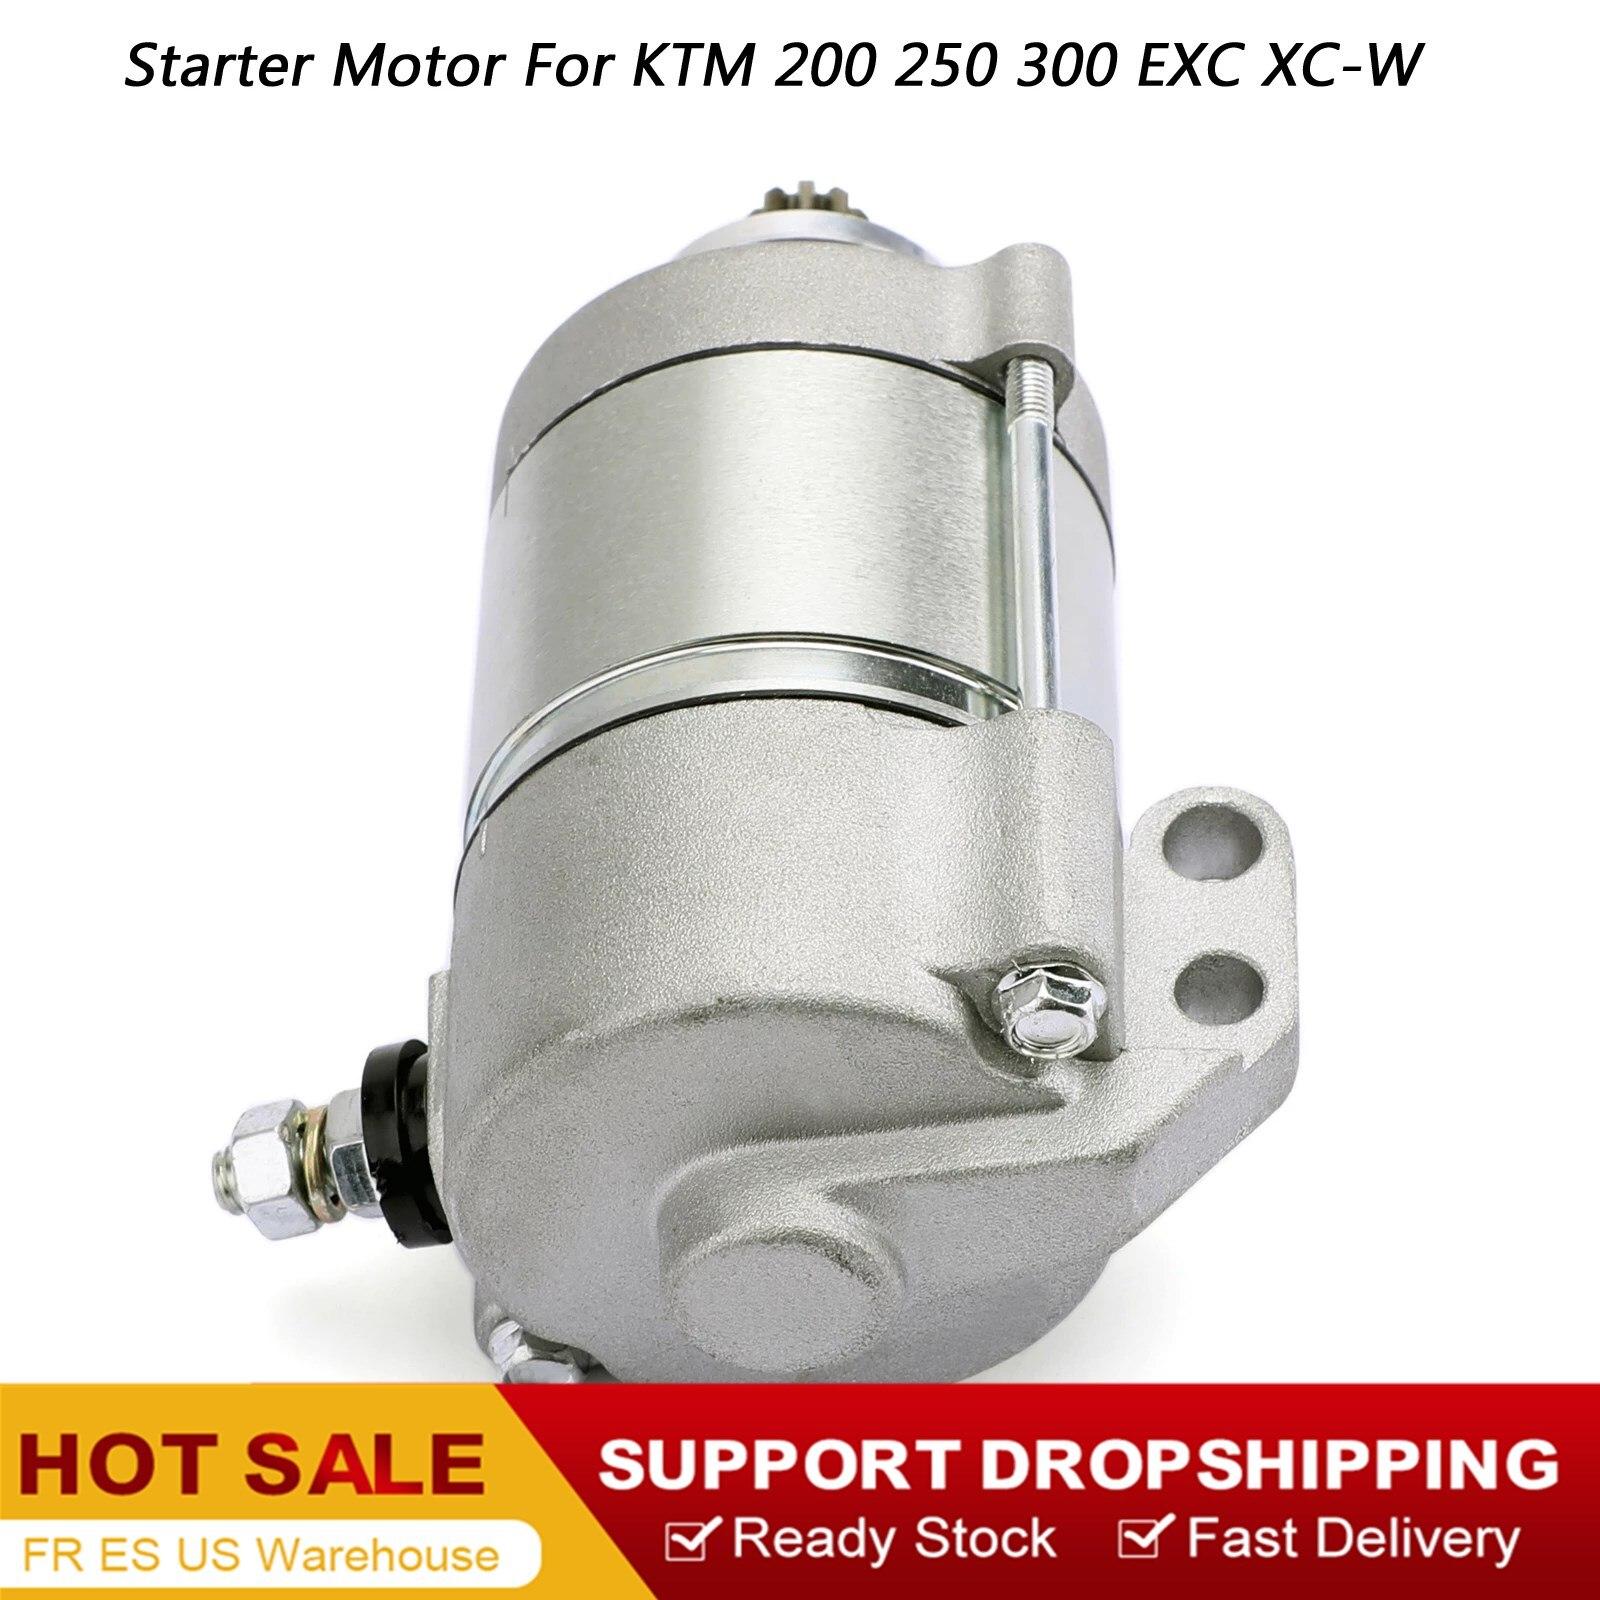 12V 410W Start motor Starter Motor 55140001100 55140001000 Für KTM 200 250 300 XC-W EXC EXC-E XC 2008-2012 2009 Motor Starter